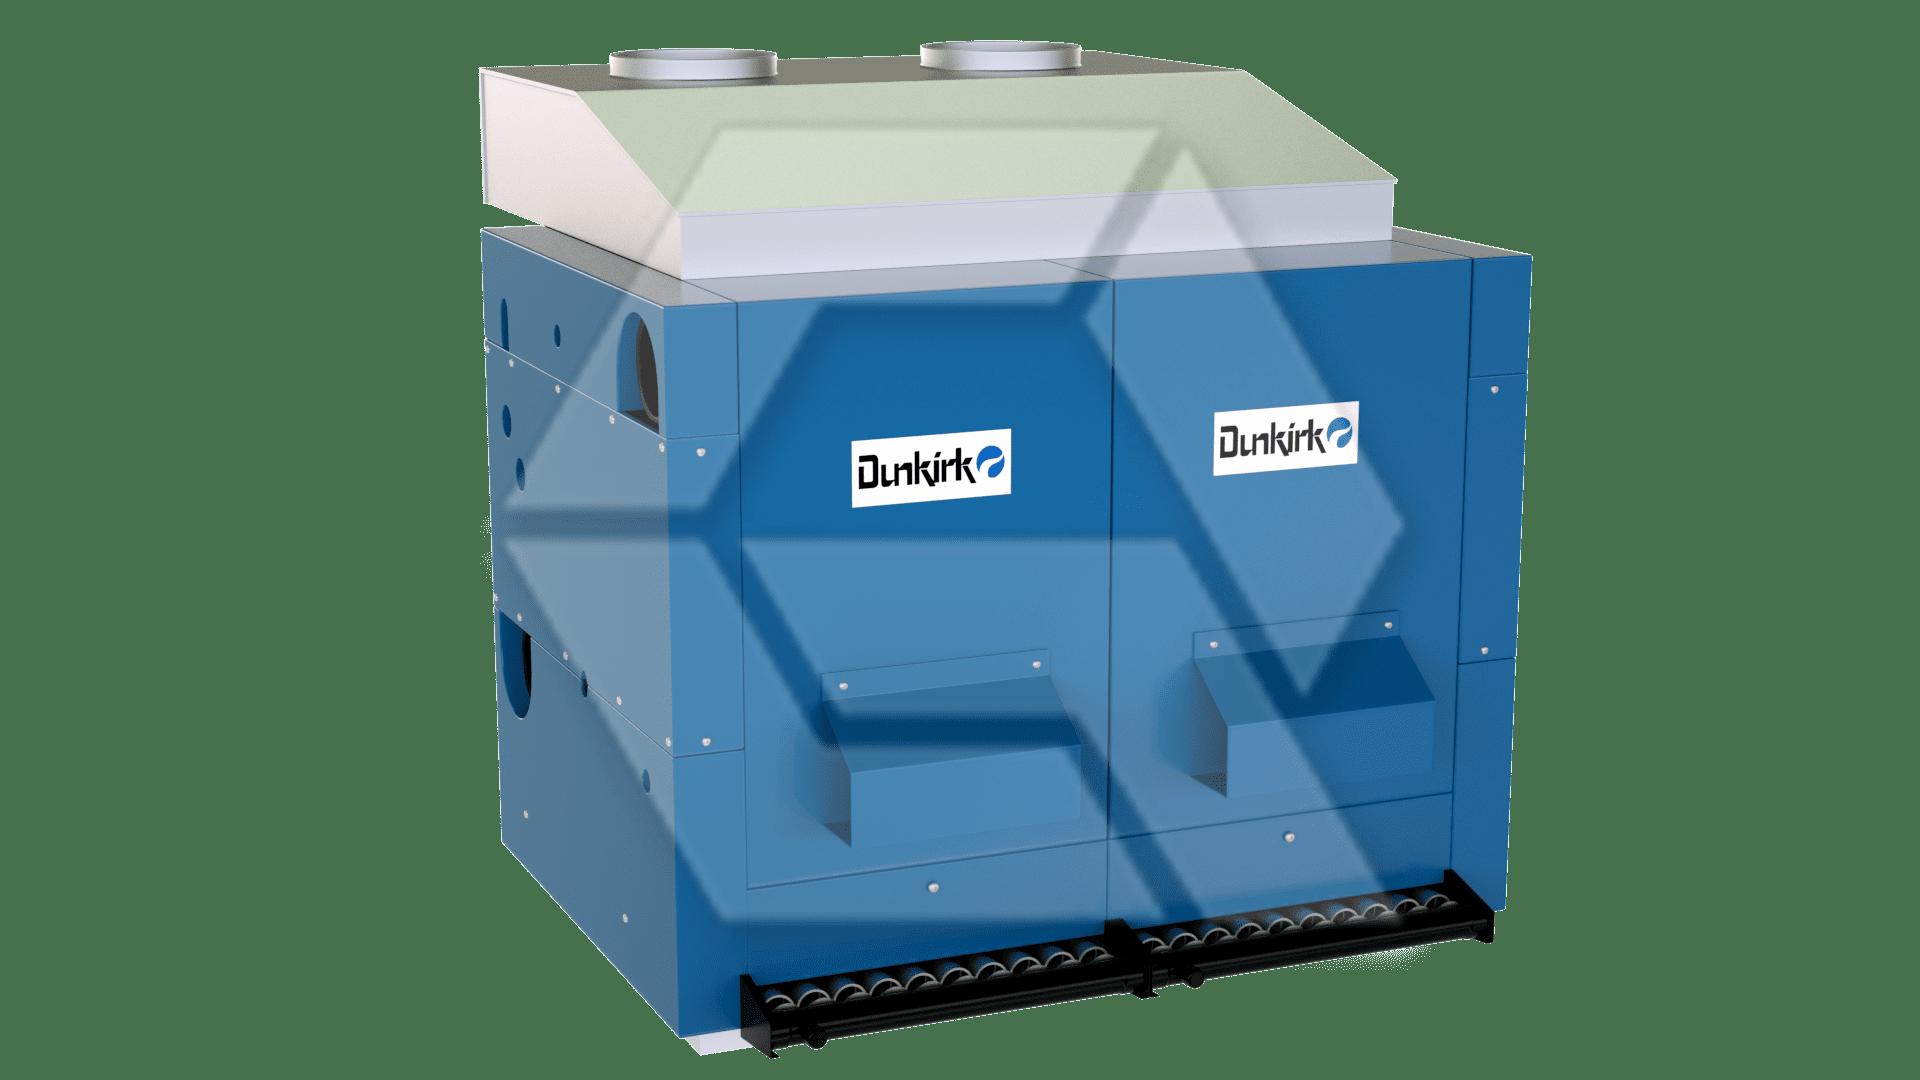 Dunkirk D249 Double Boiler